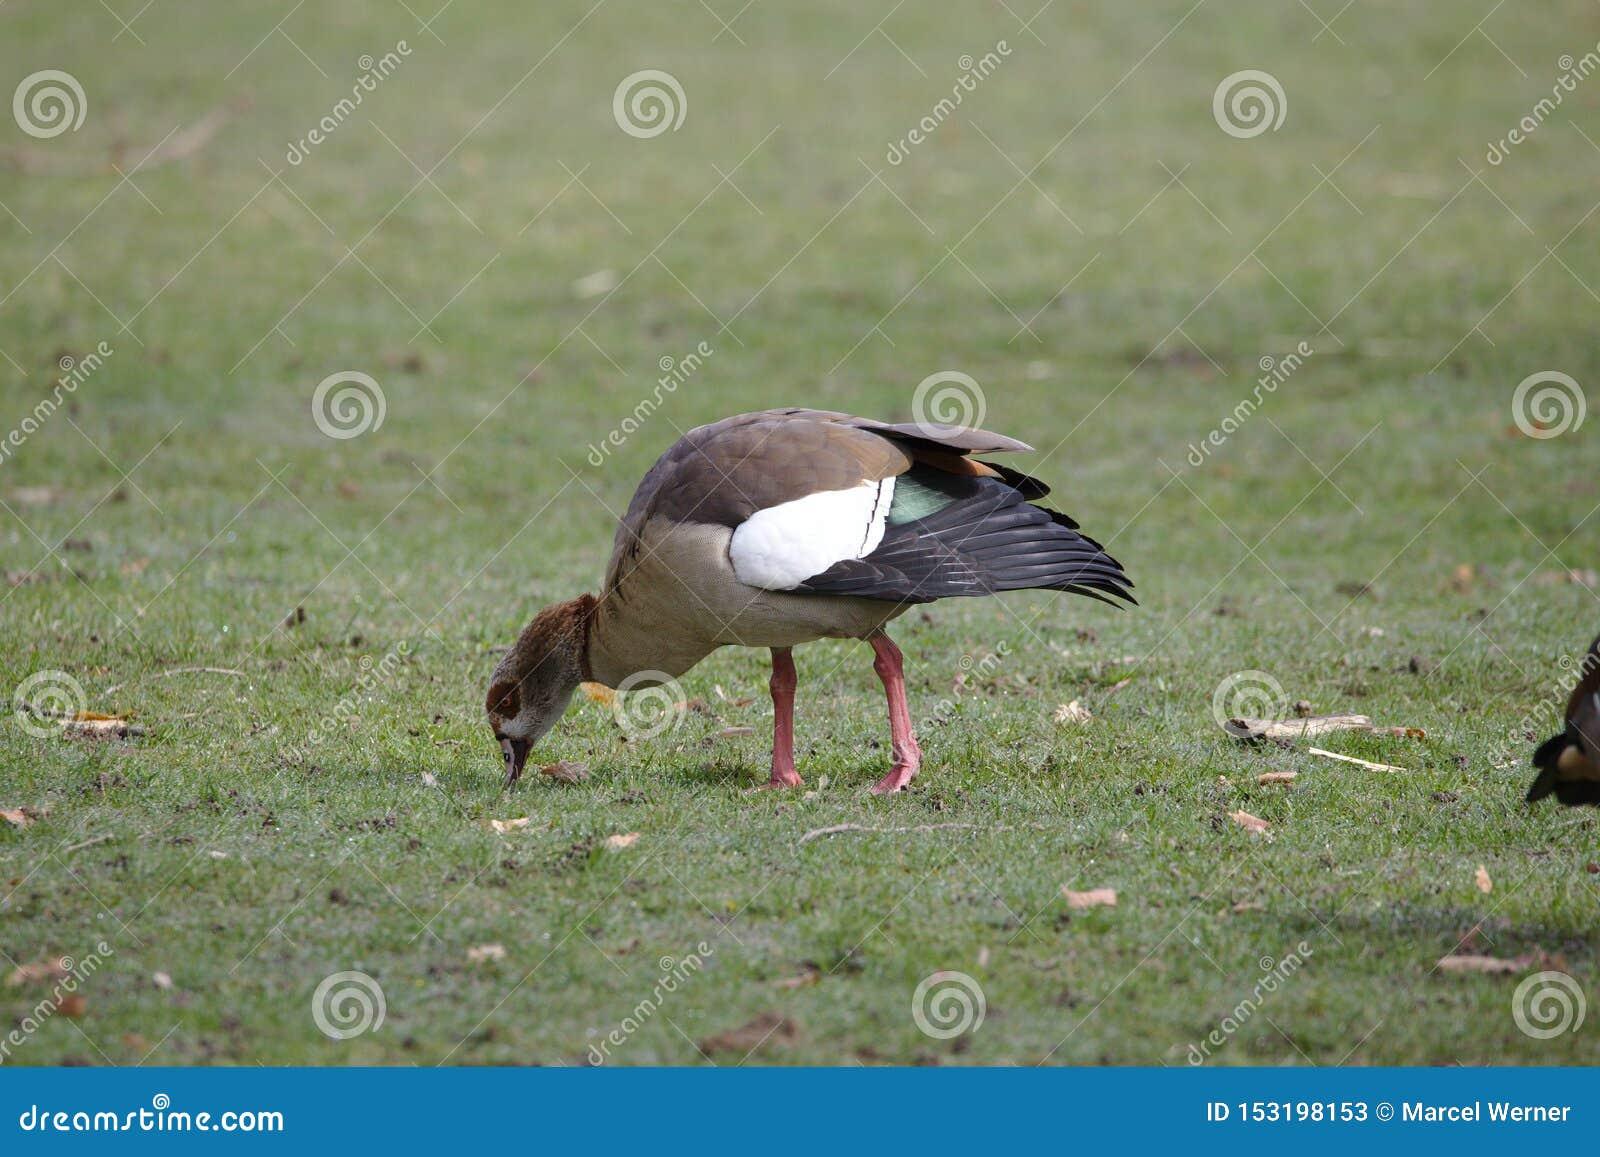 Egyptian goose grazing on grass